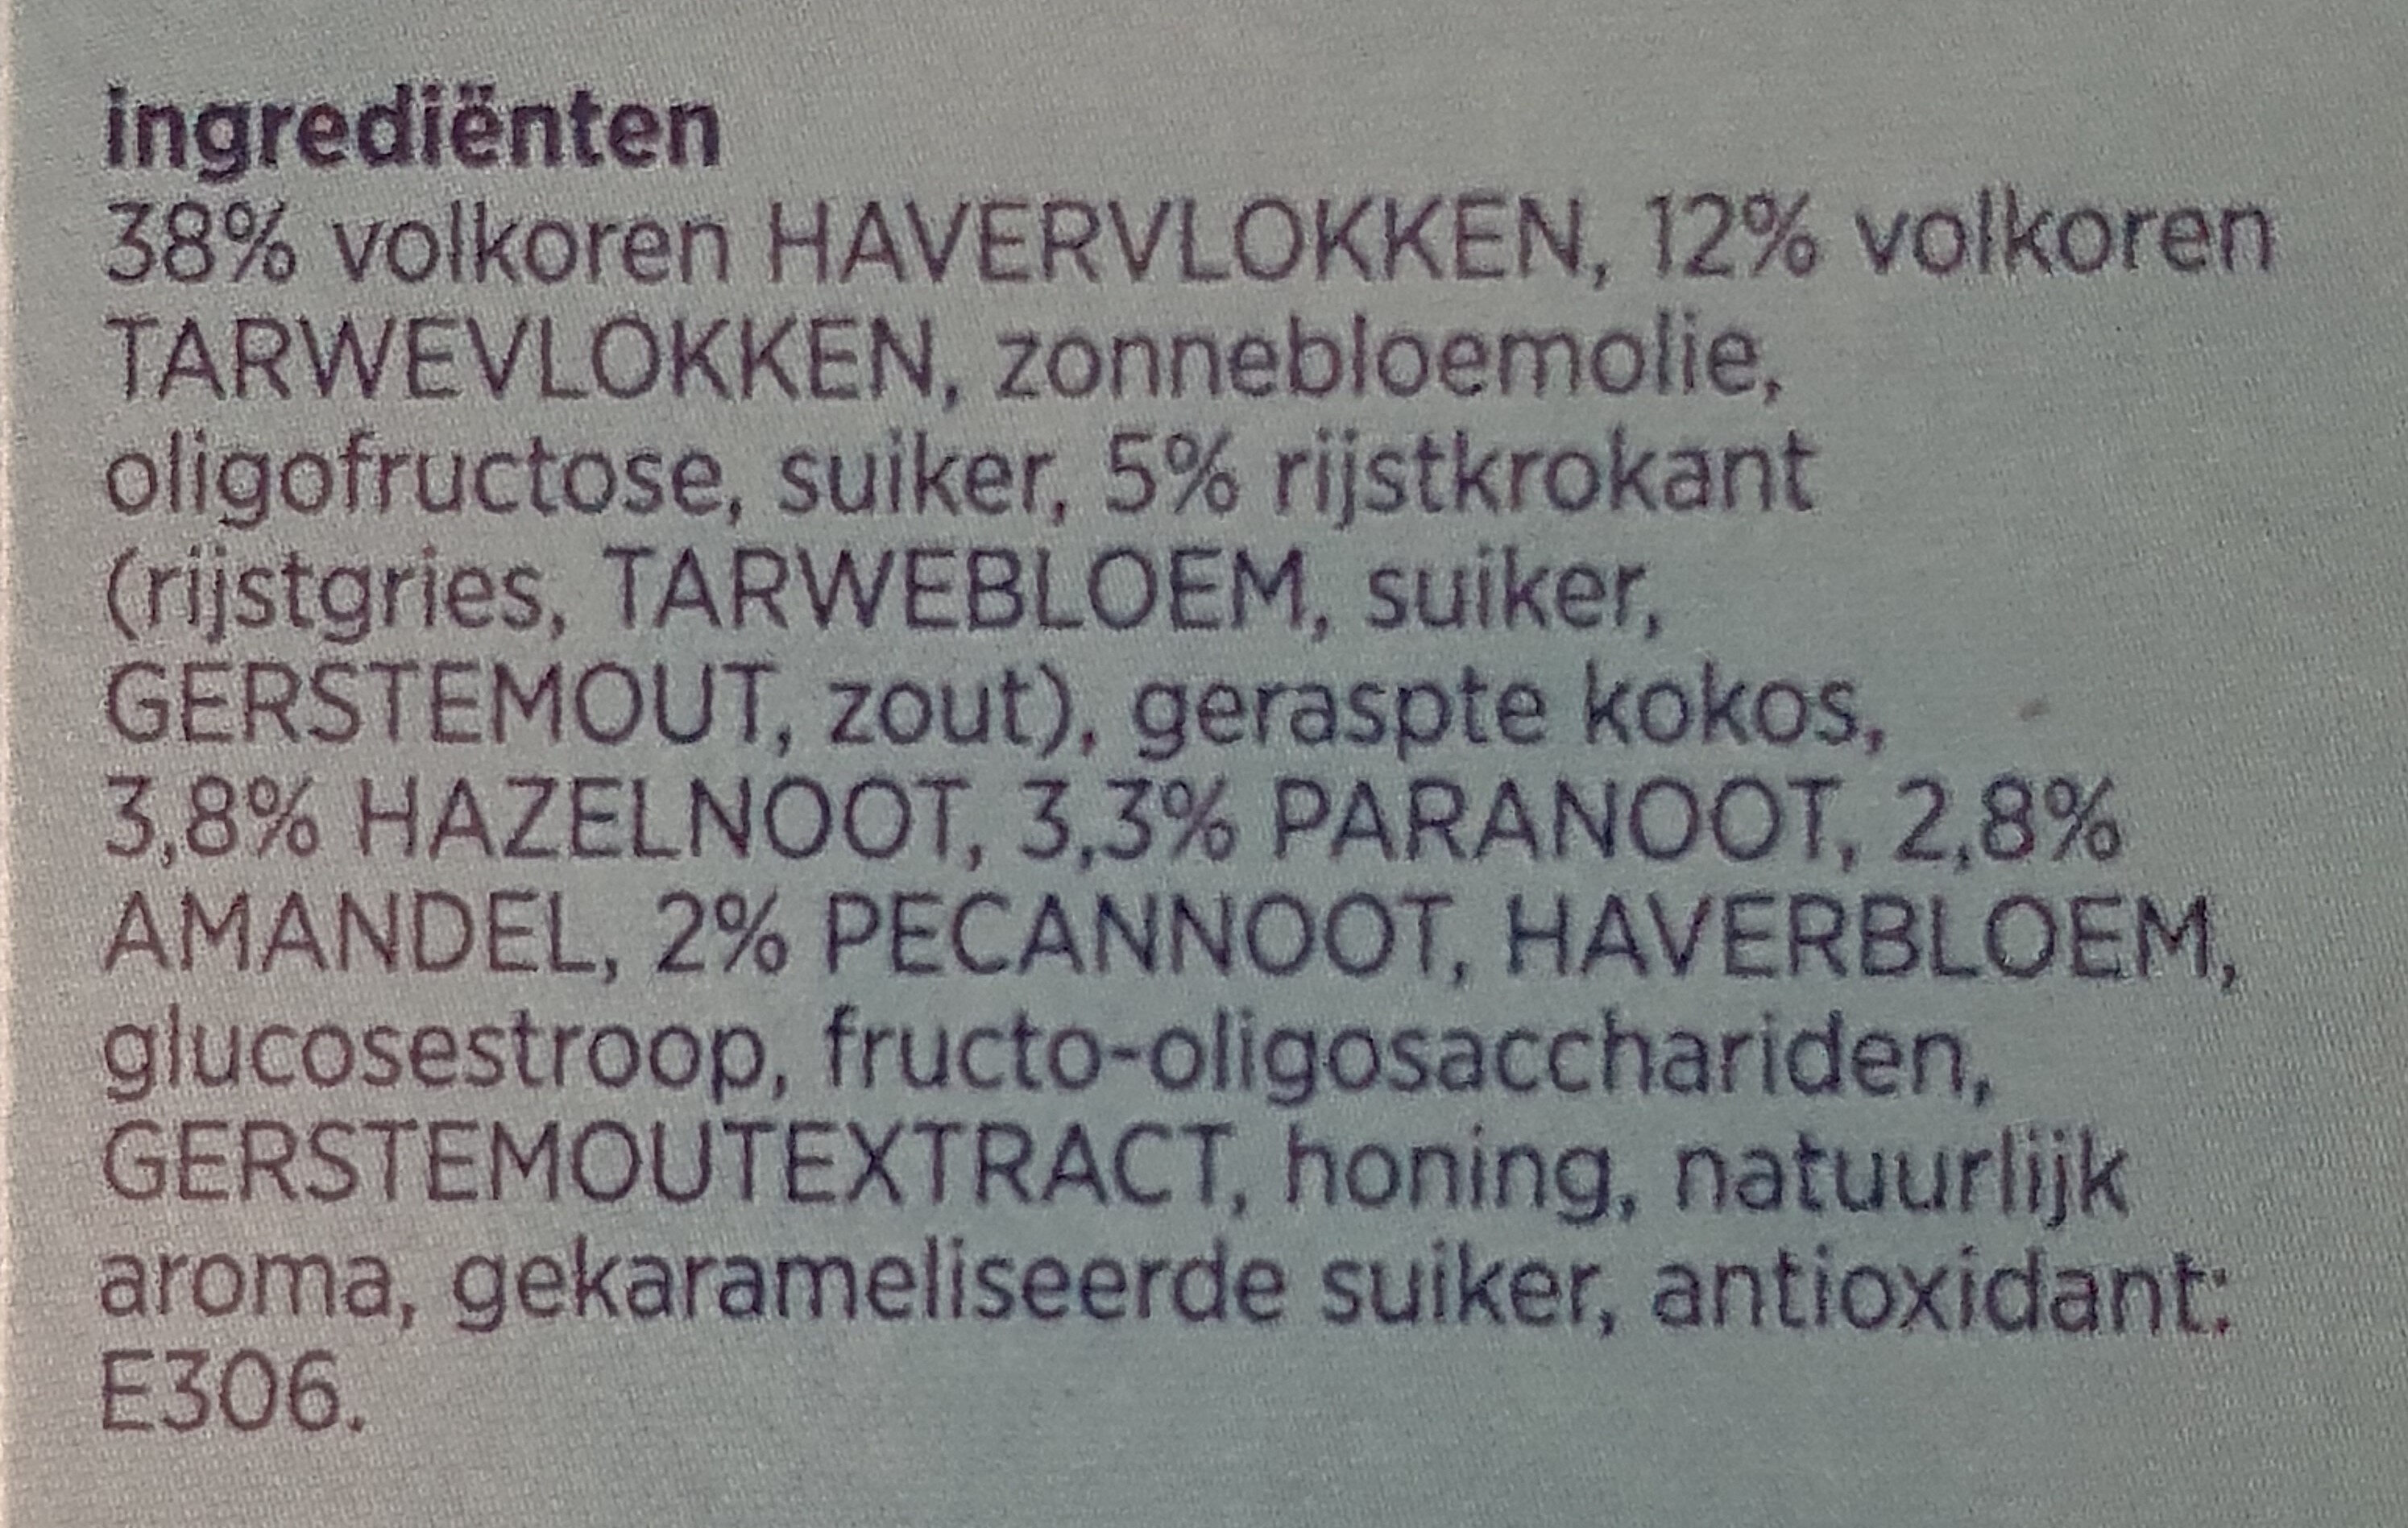 Krokante muesli 4 noten - Ingrediënten - nl